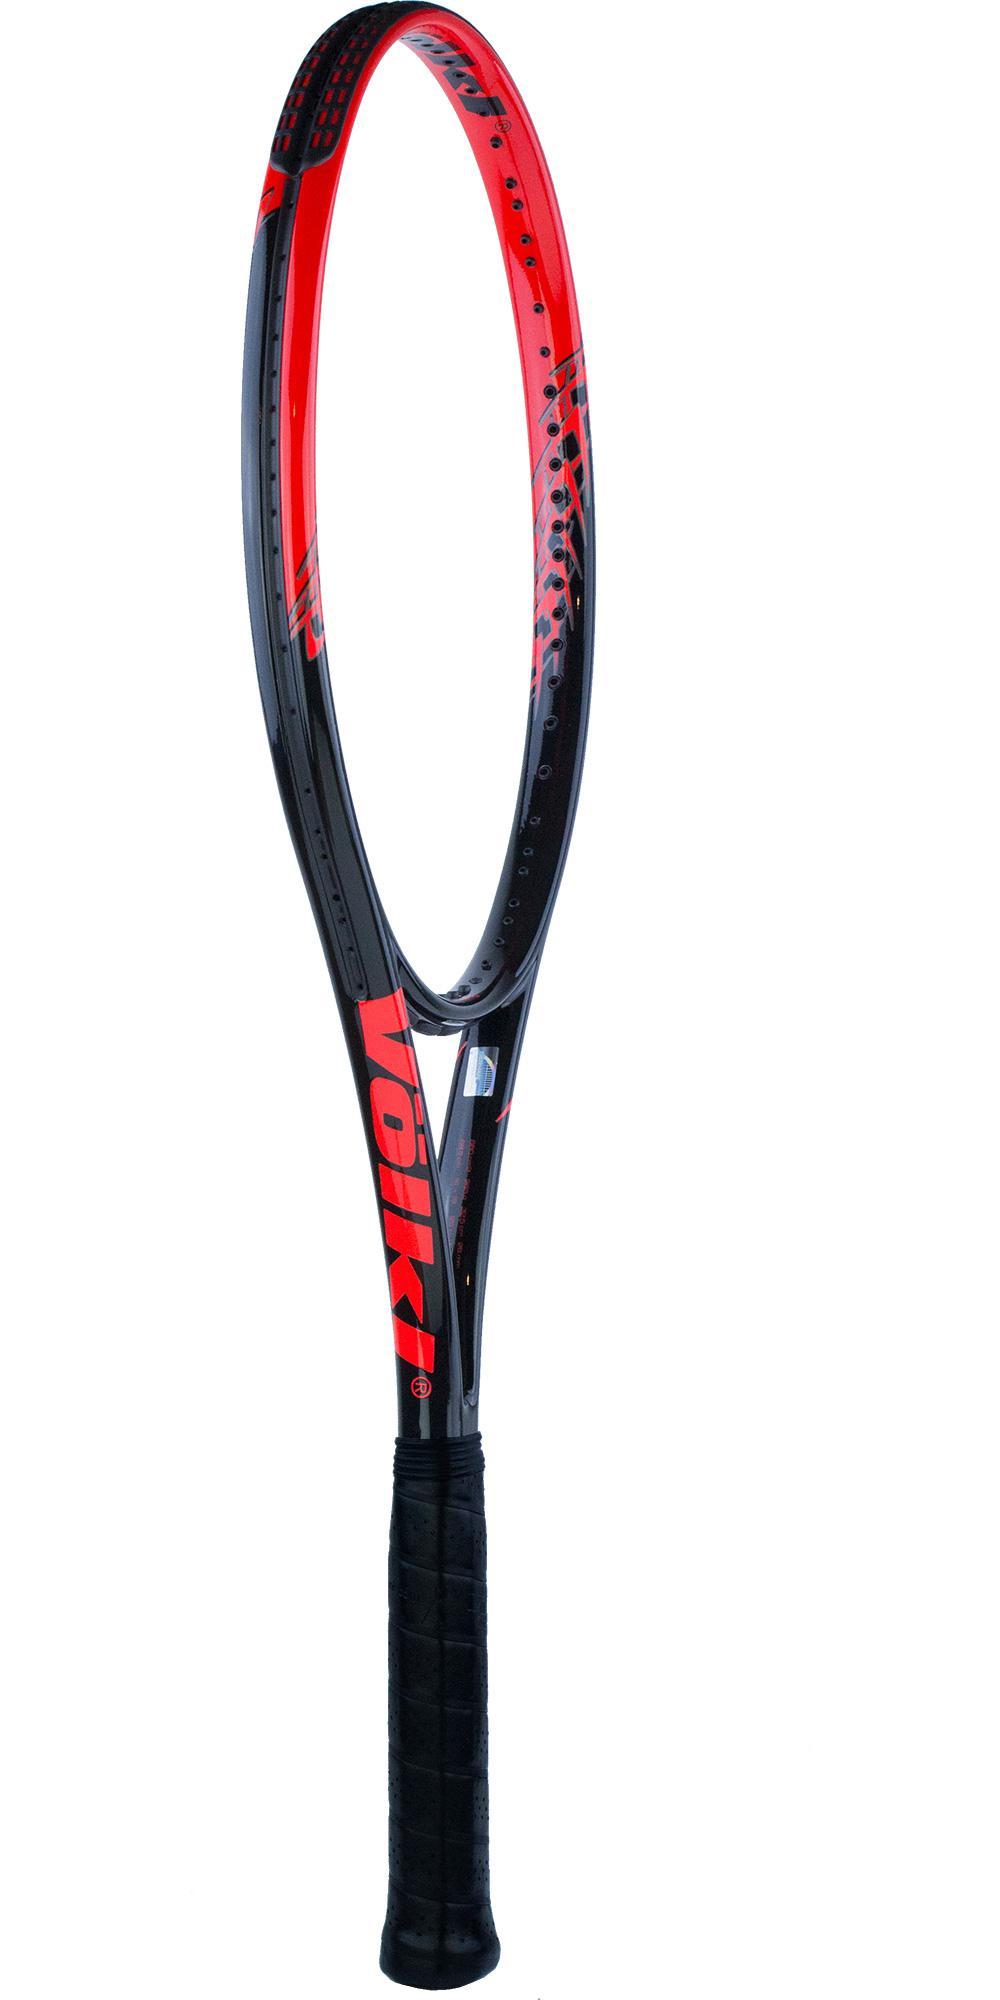 Volkl Team Speed Tennis Racket - Black/Lava - Tennisnuts.com